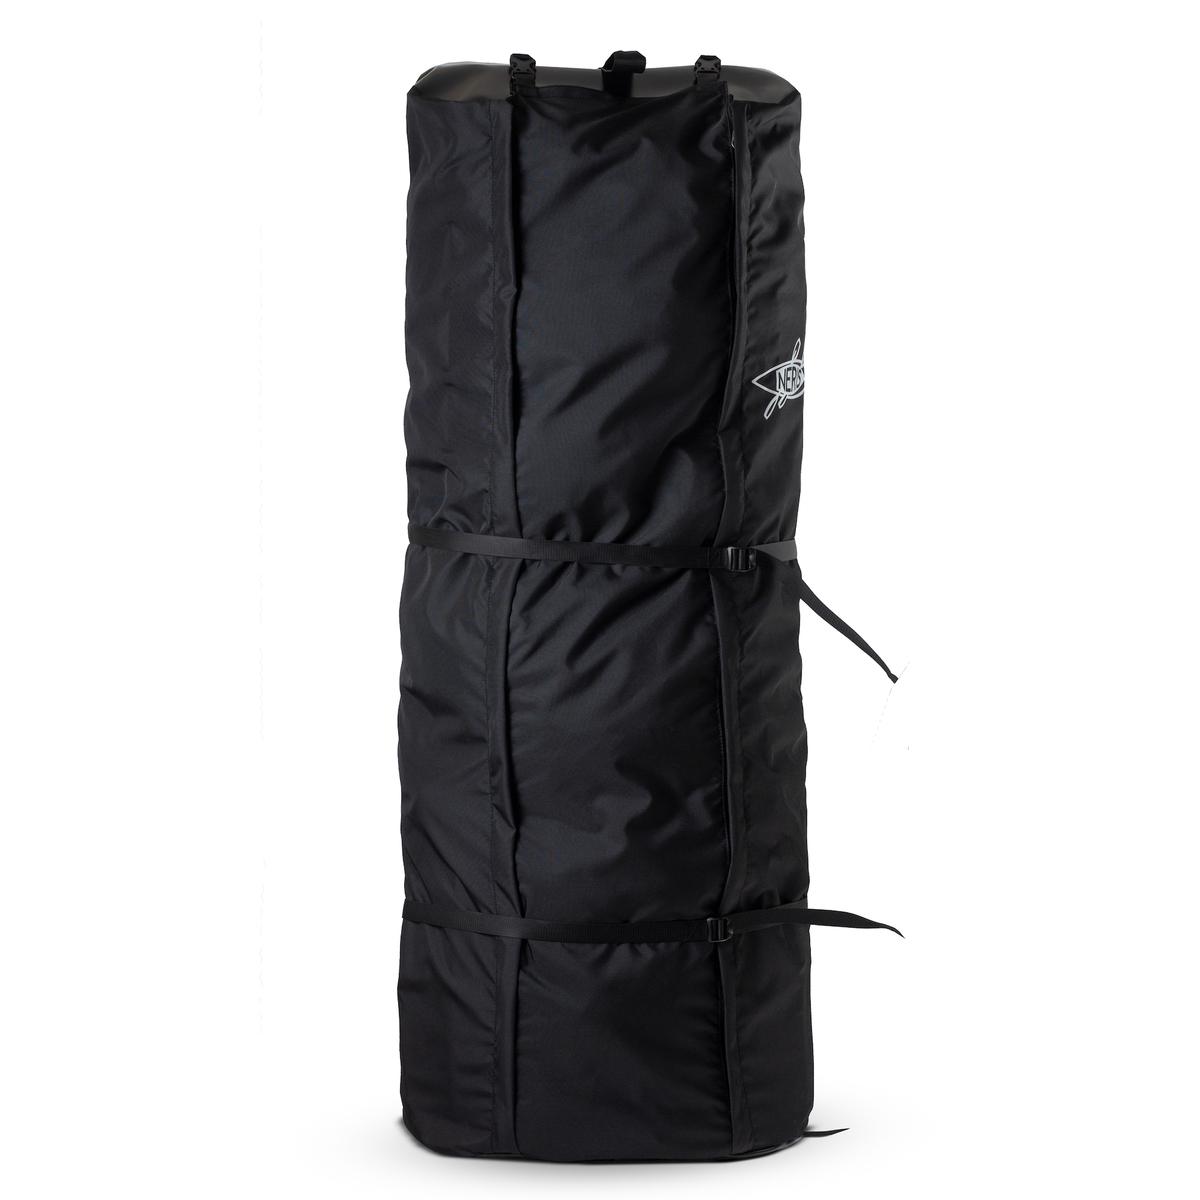 "Рюкзак для байдарки Neris Alu-2 ""все в одном"""